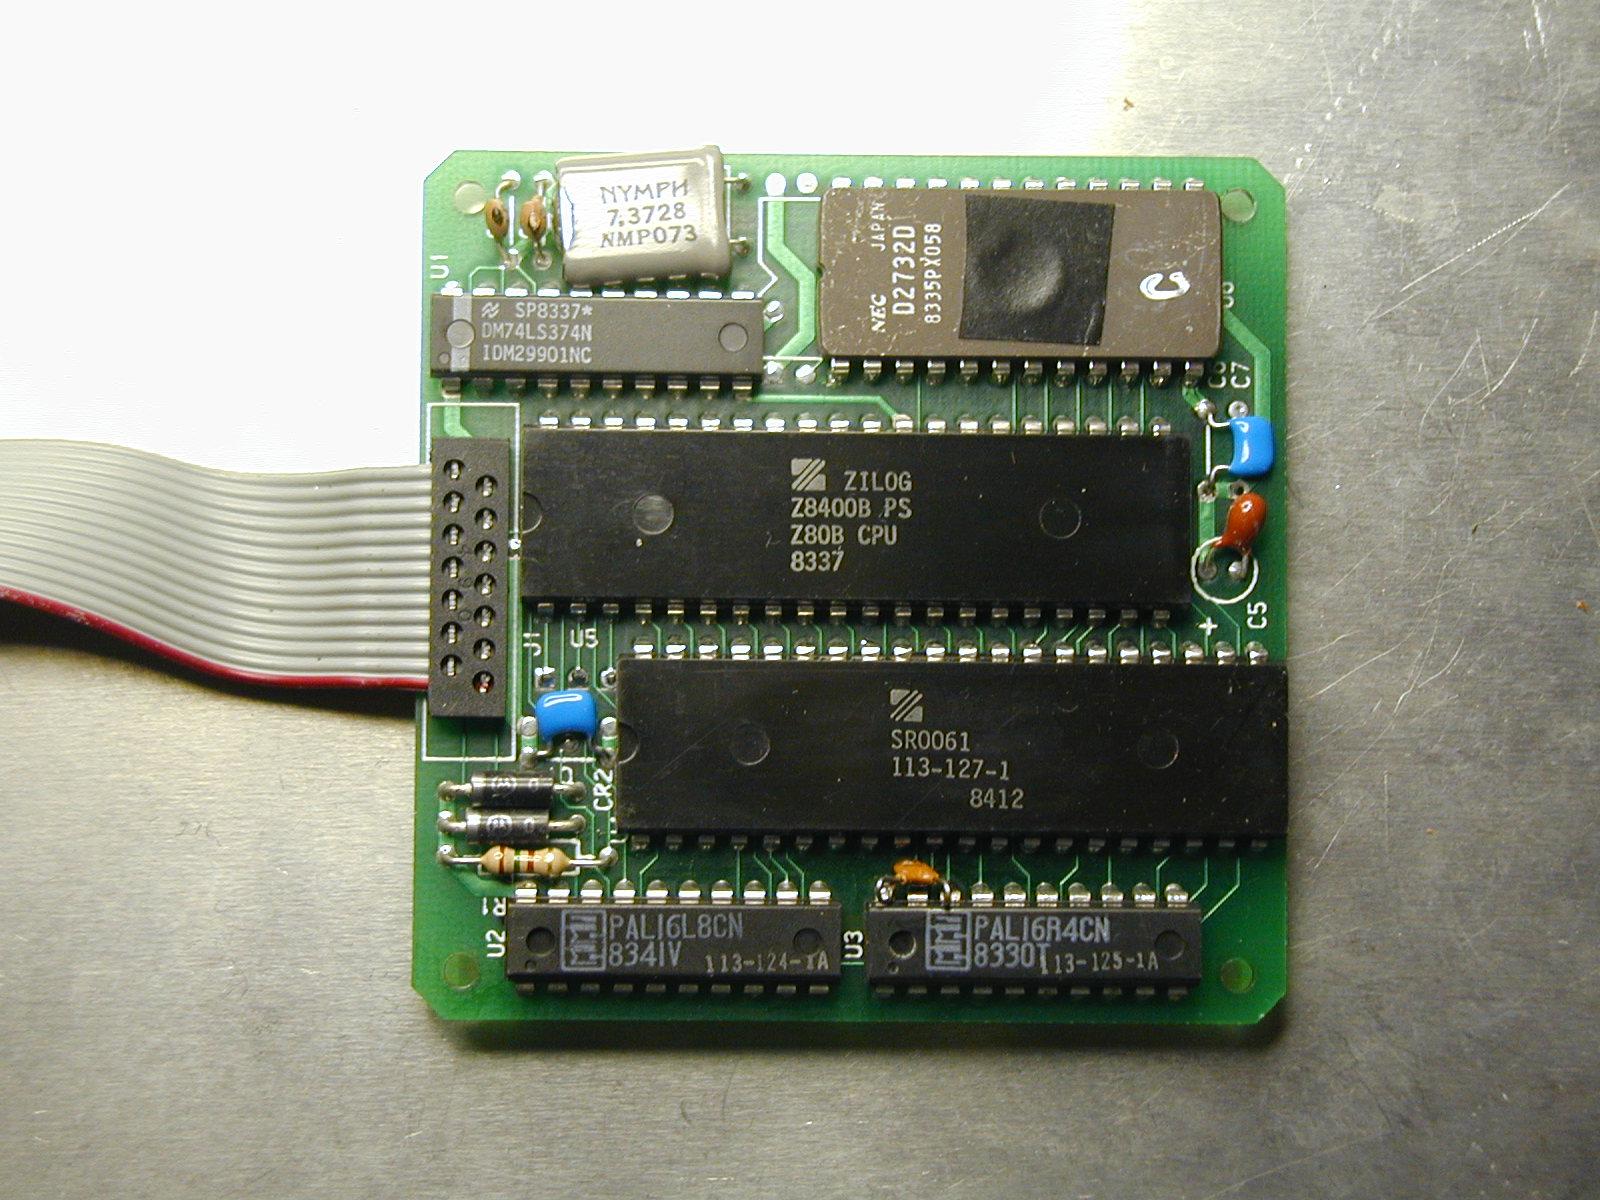 Nicolet Z80 Nice Emulator Tech Info